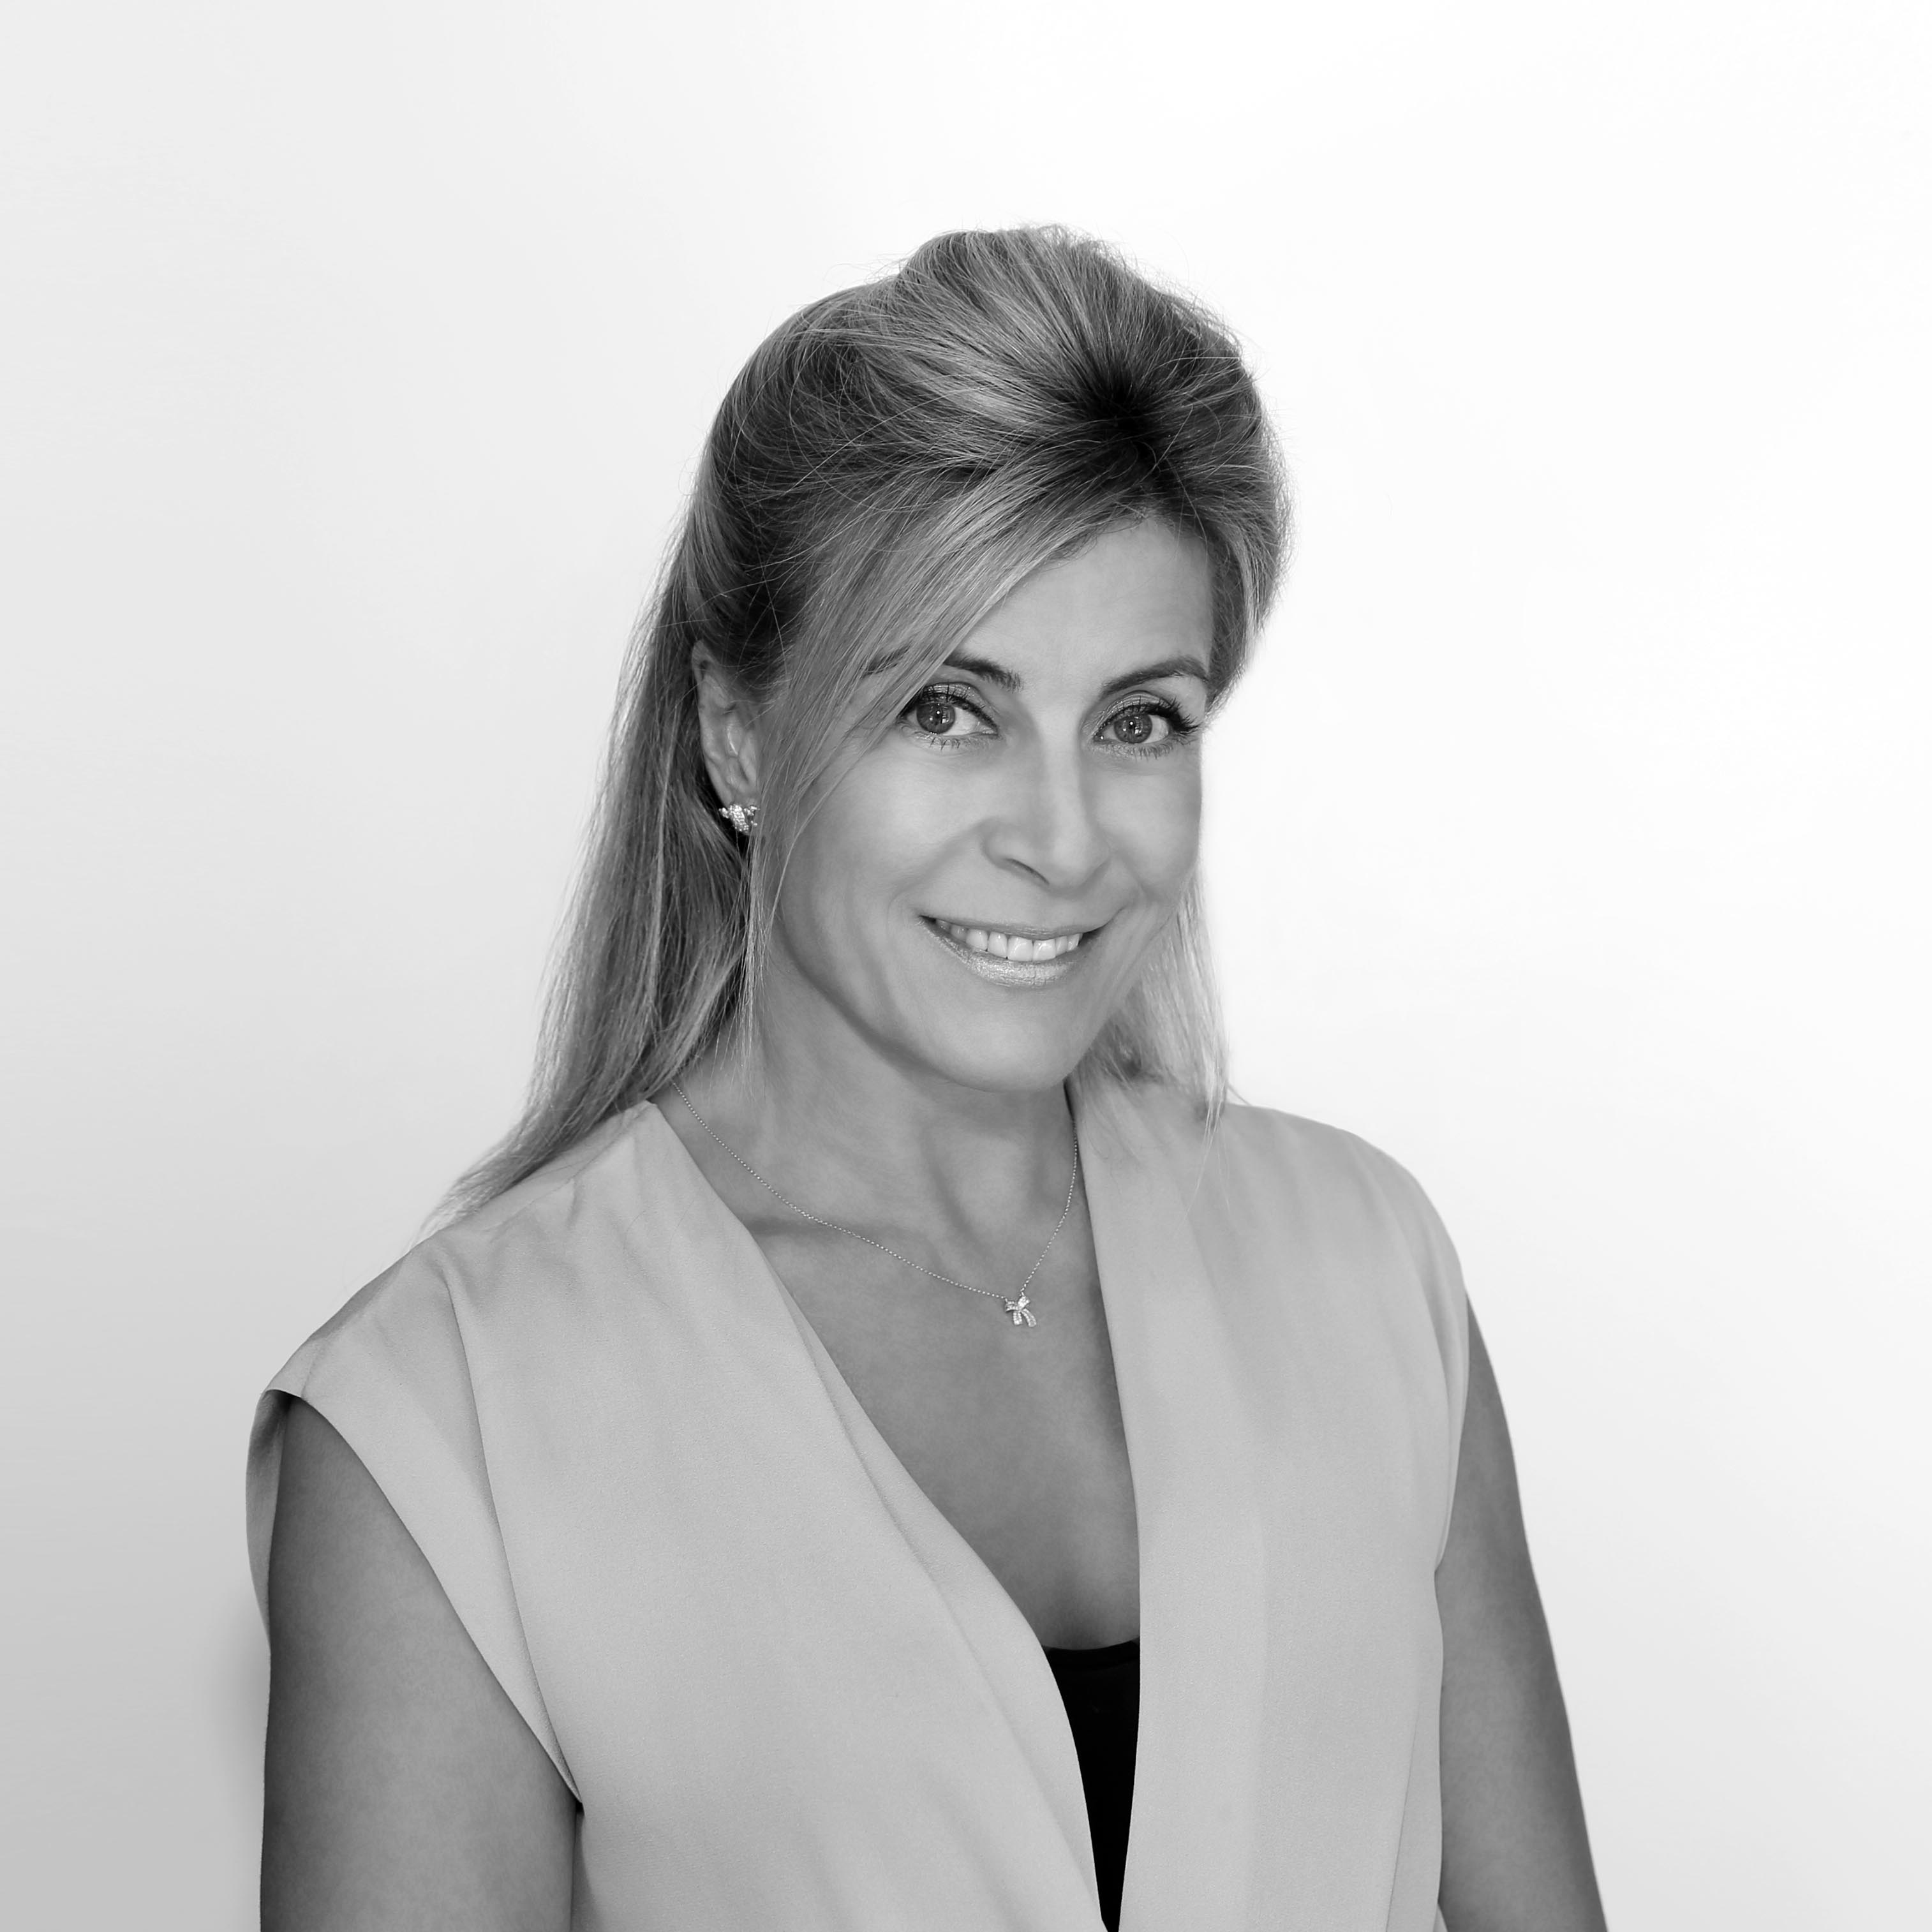 Heloisa Campos